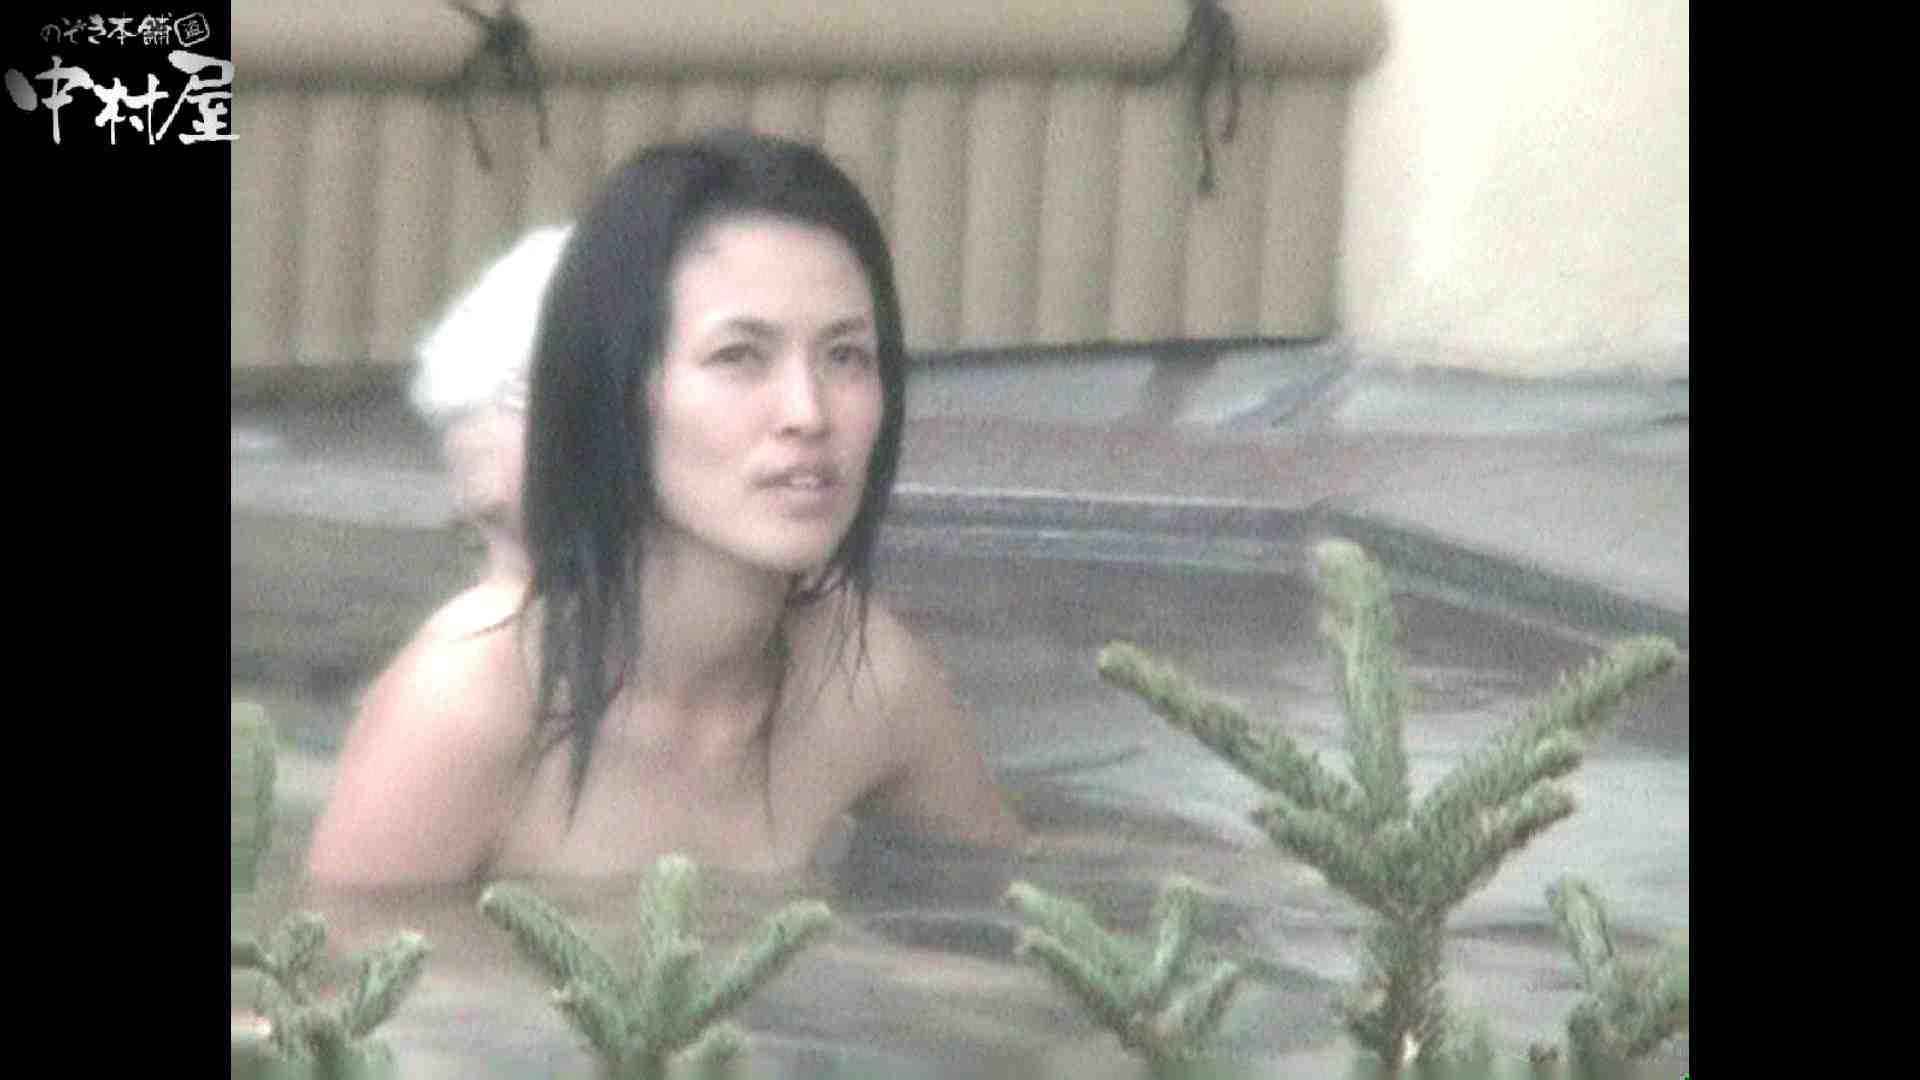 Aquaな露天風呂Vol.933 盗撮 おまんこ動画流出 78PICs 5